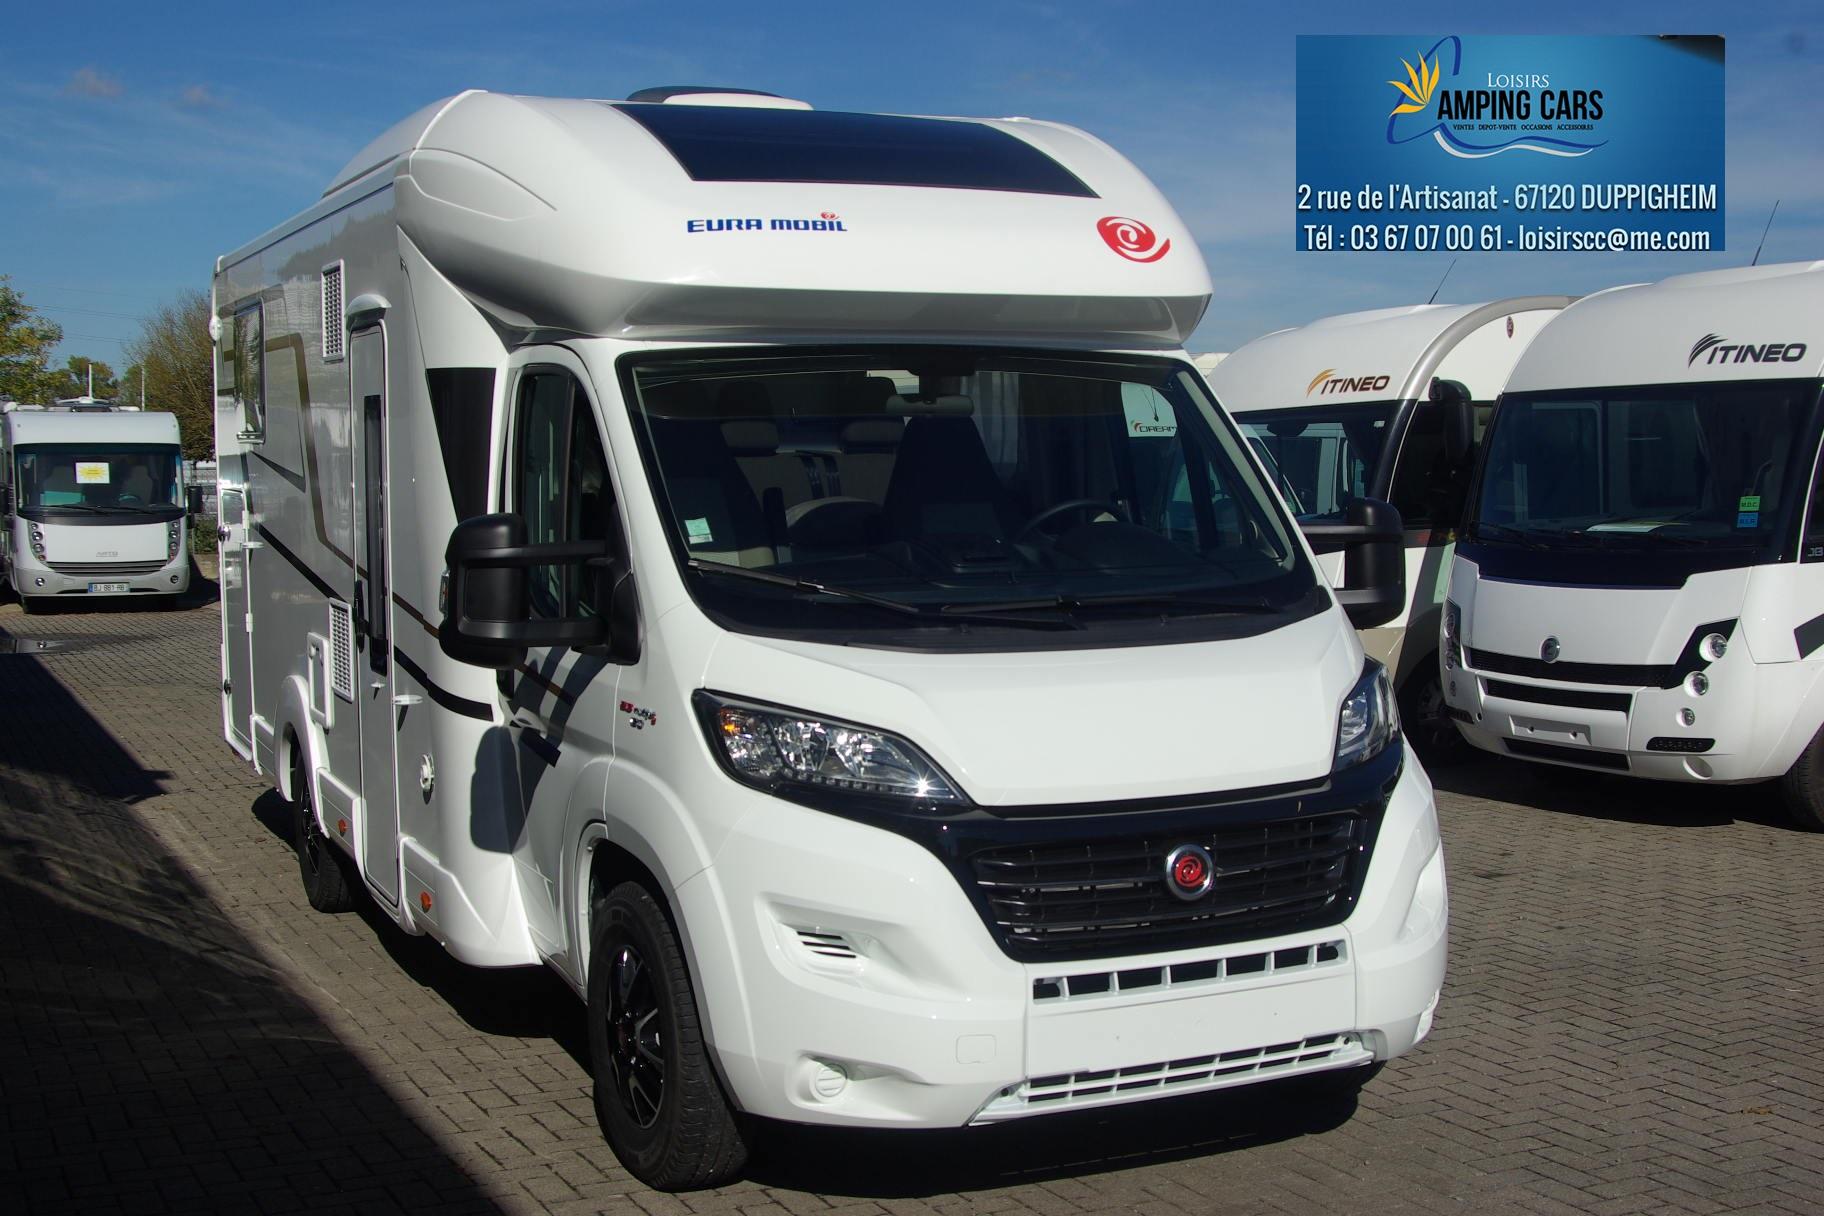 eura mobil profila rs 720 qb neuf porteur fiat ducato 130cv camping car vendre en rhin. Black Bedroom Furniture Sets. Home Design Ideas